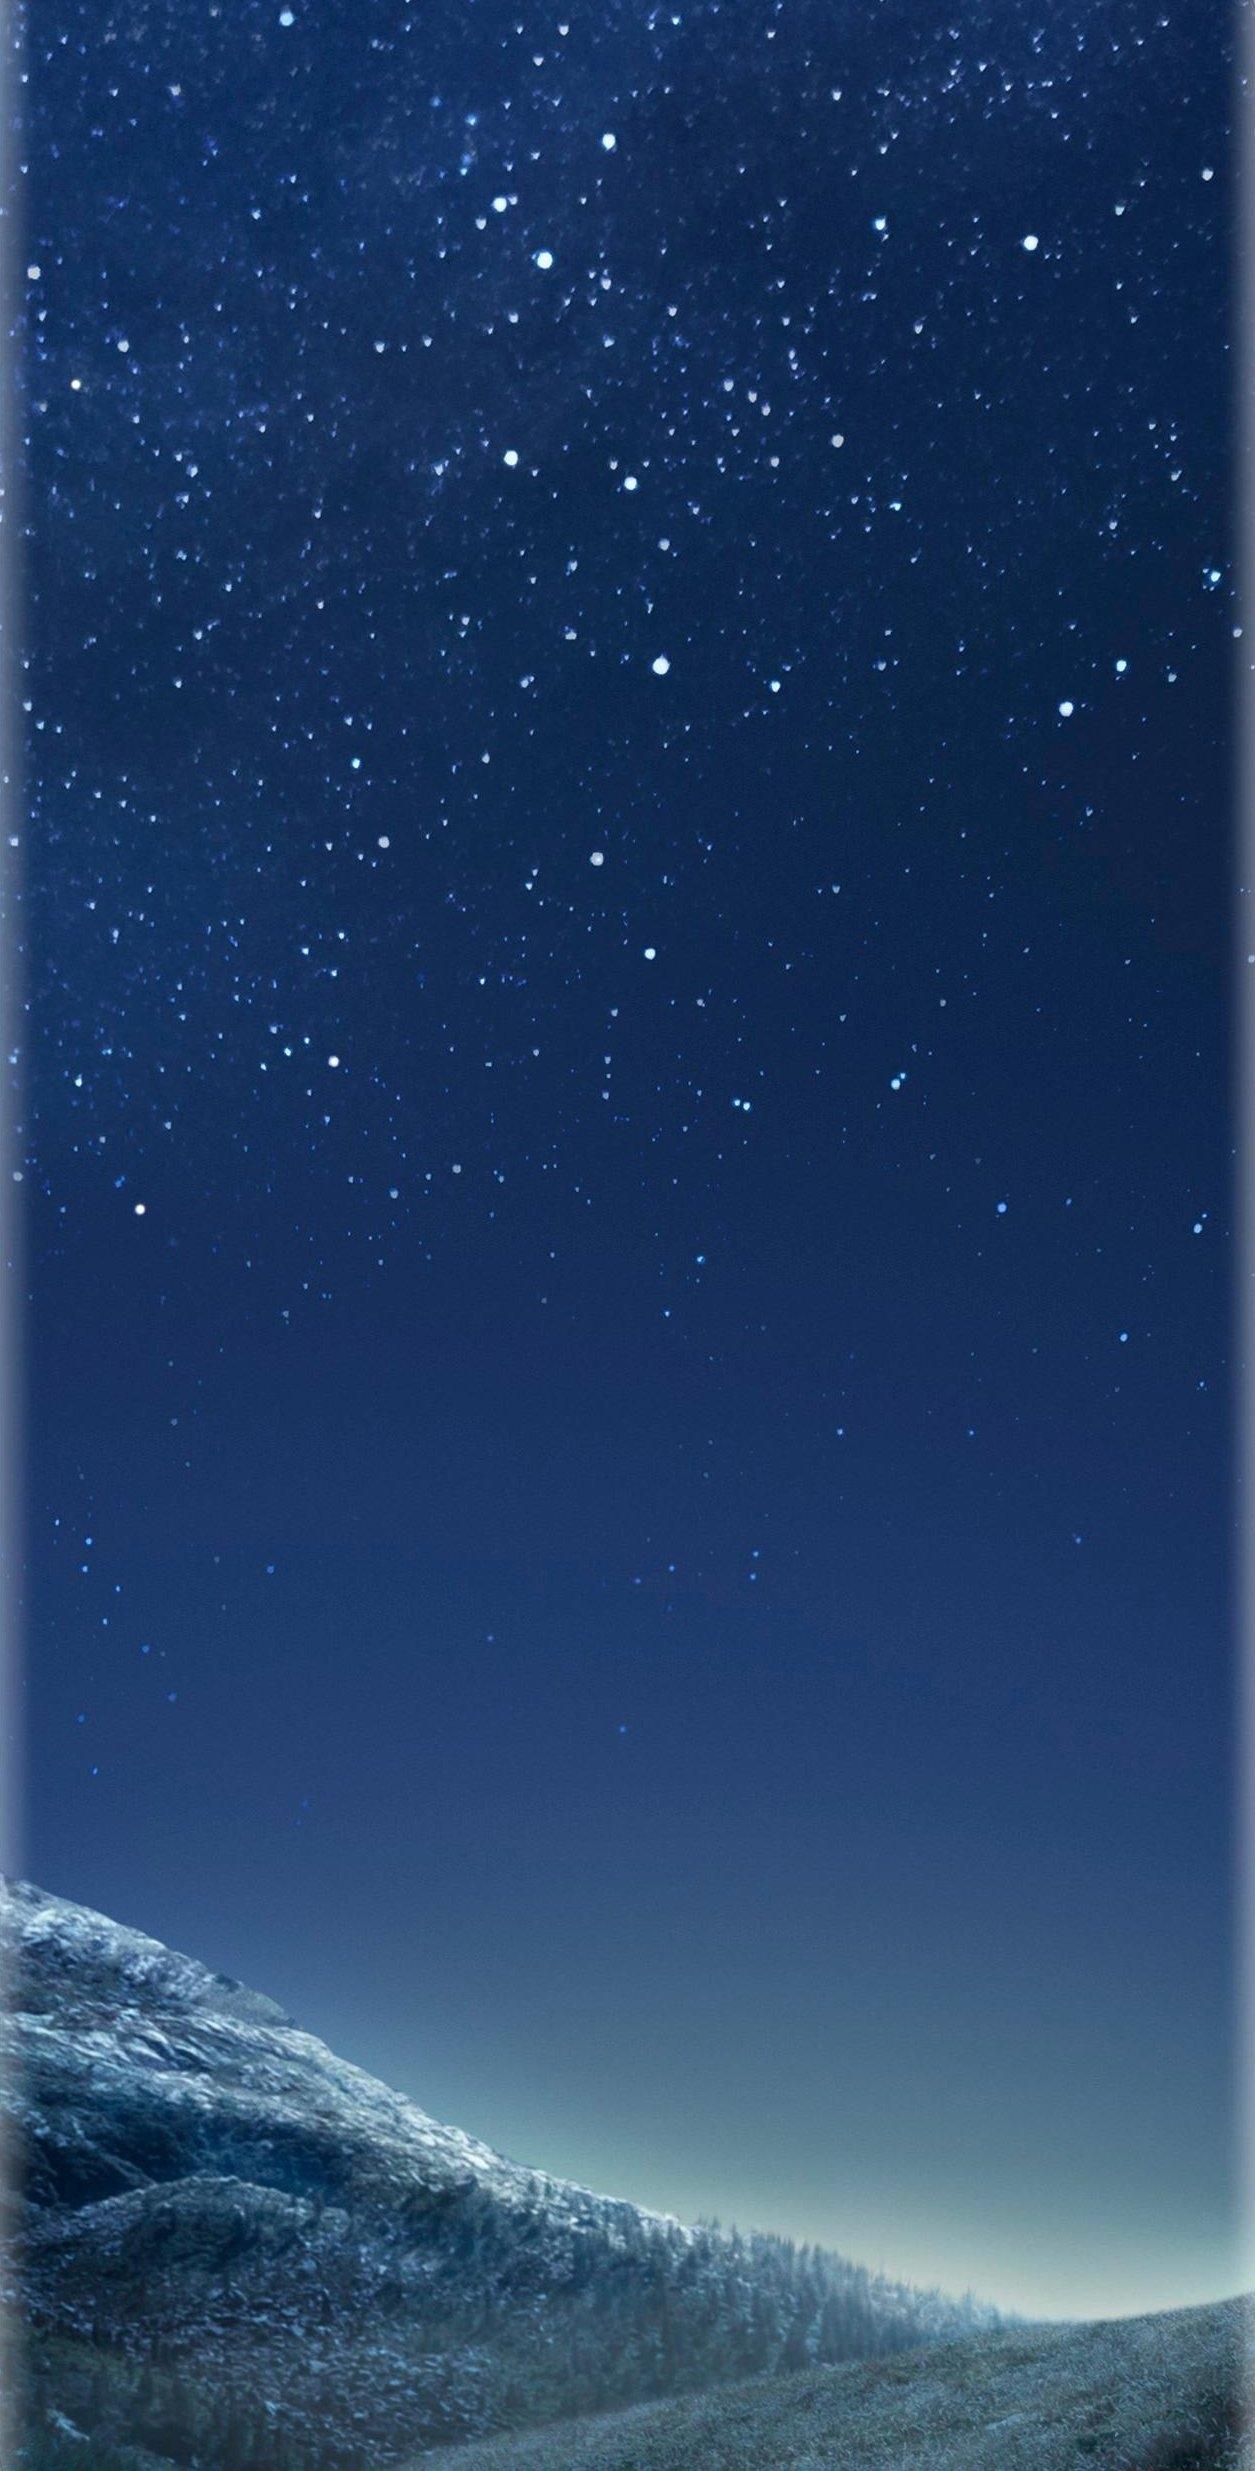 S8 galaxy s8 s8 - Samsung galaxy s7 wallpaper download ...